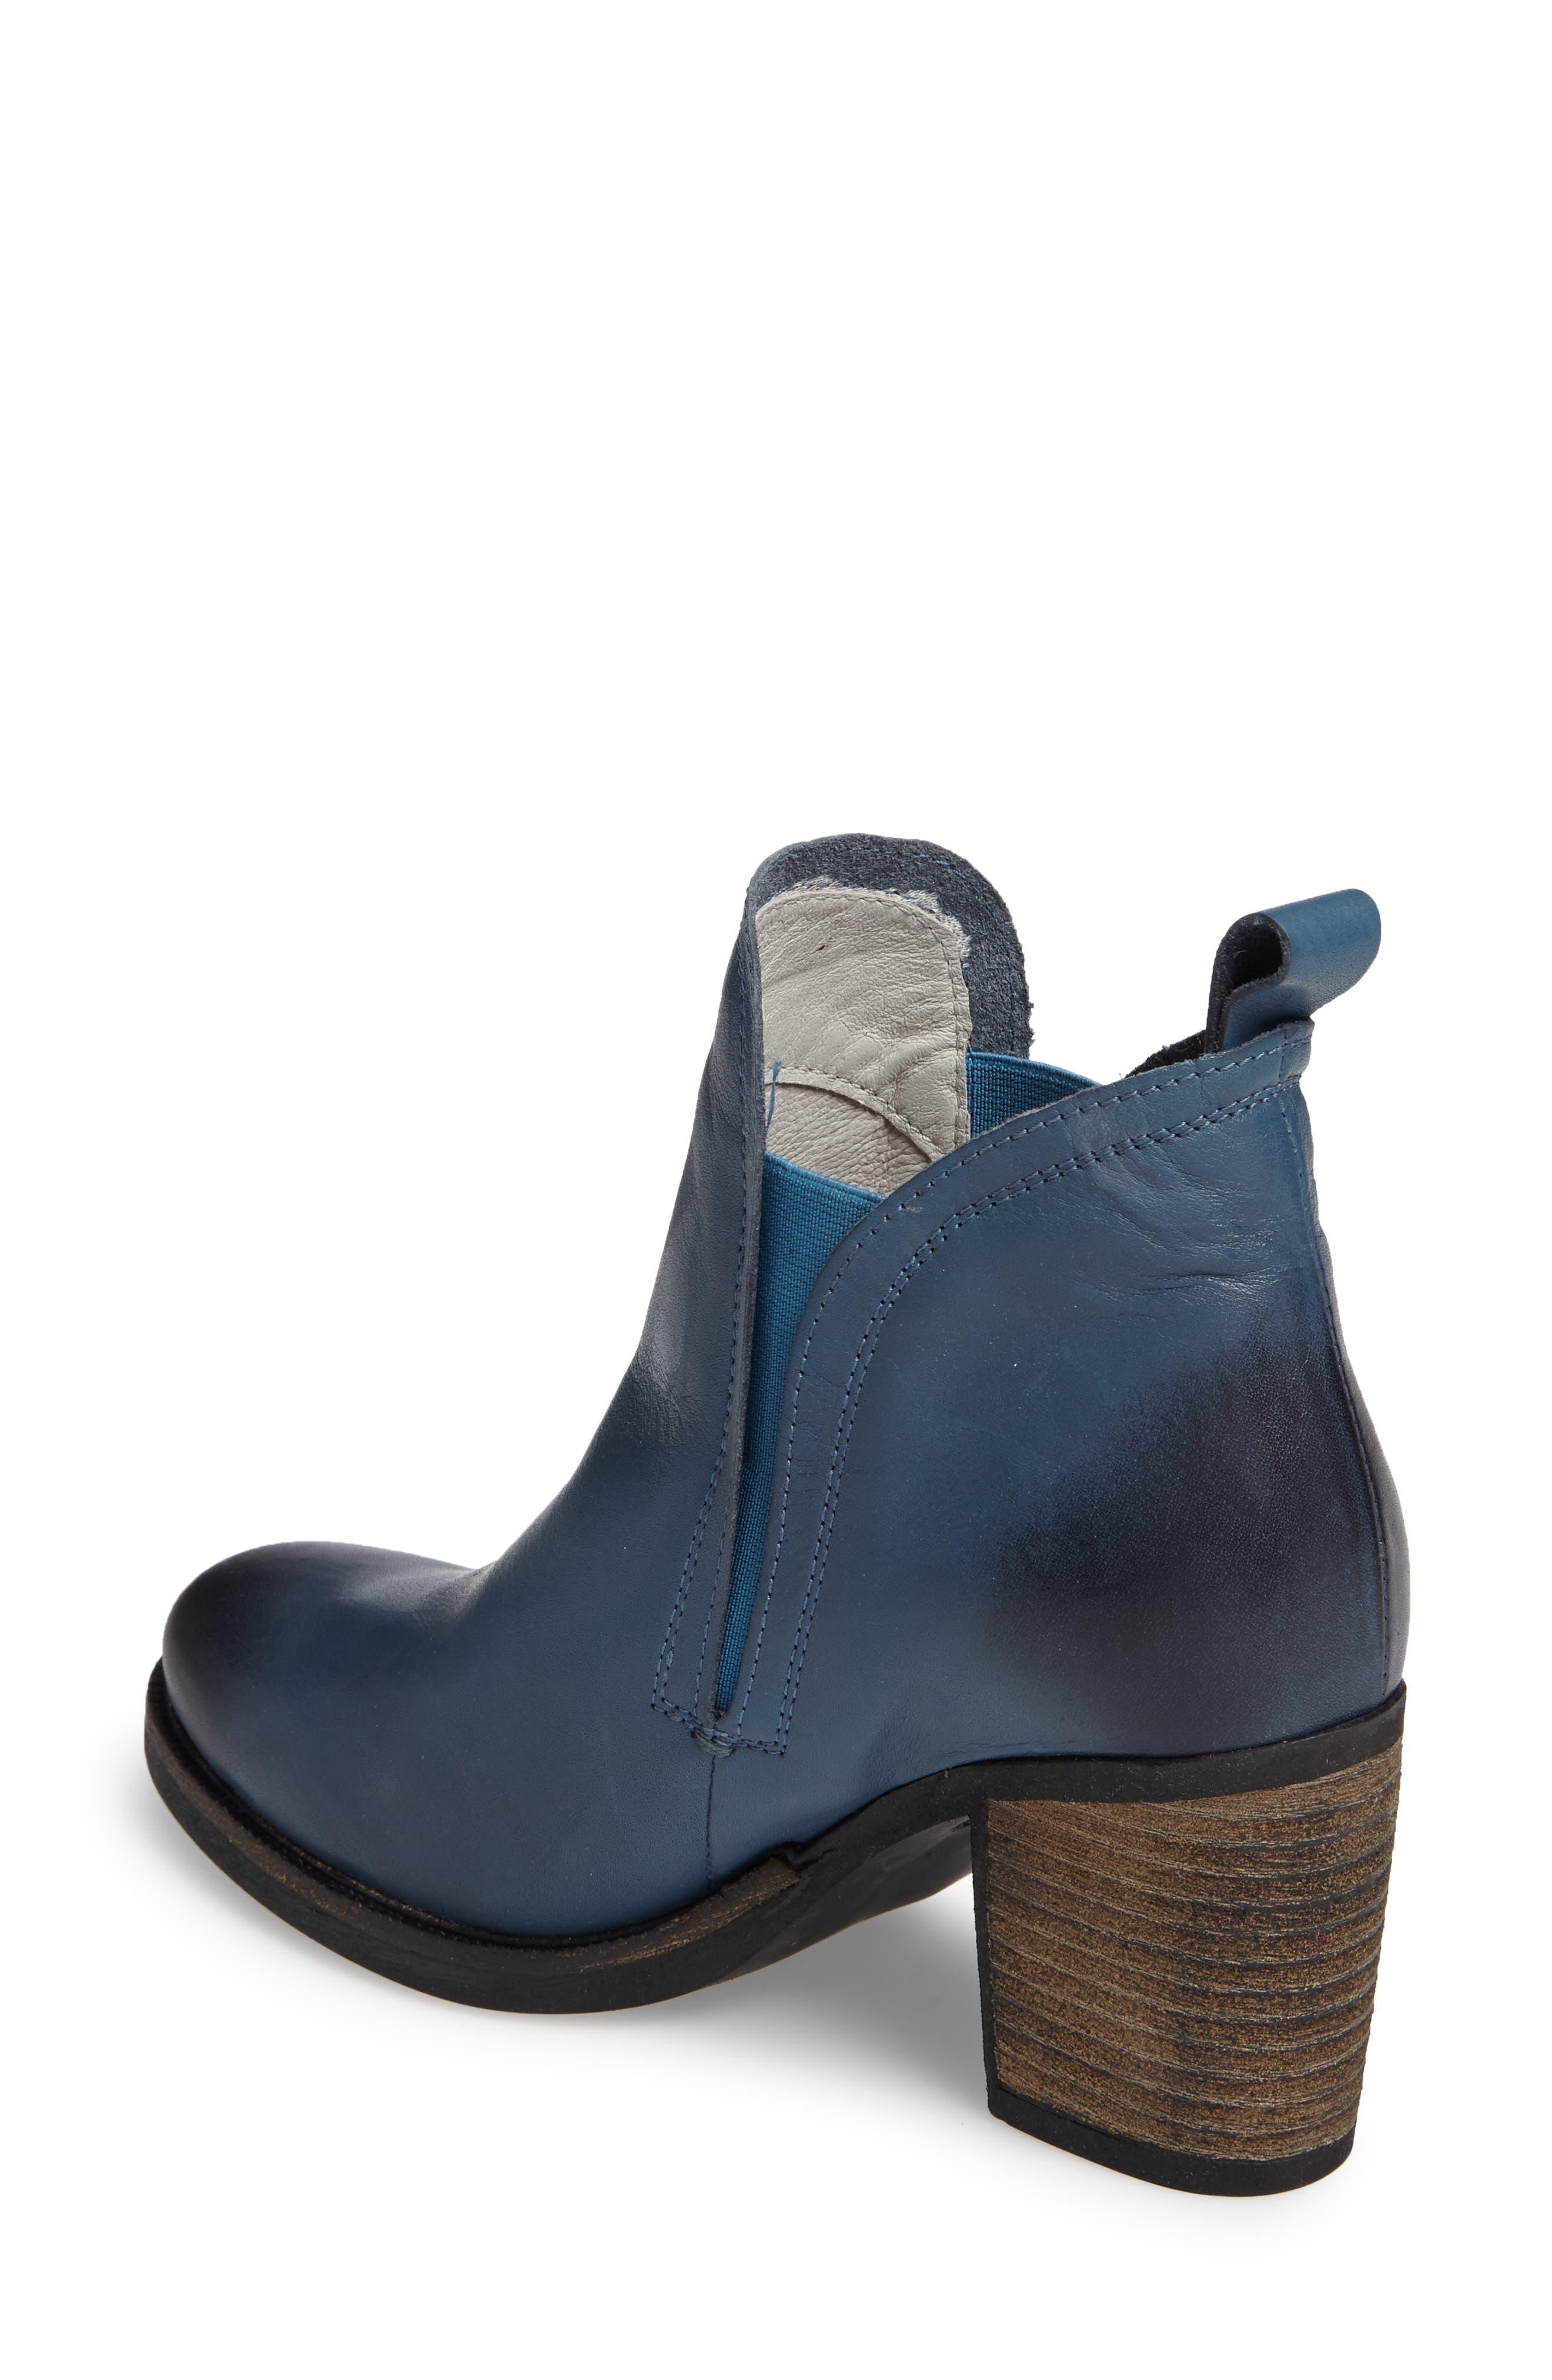 Belfielding Waterproof Chelsea Boot,                             Alternate thumbnail 9, color,